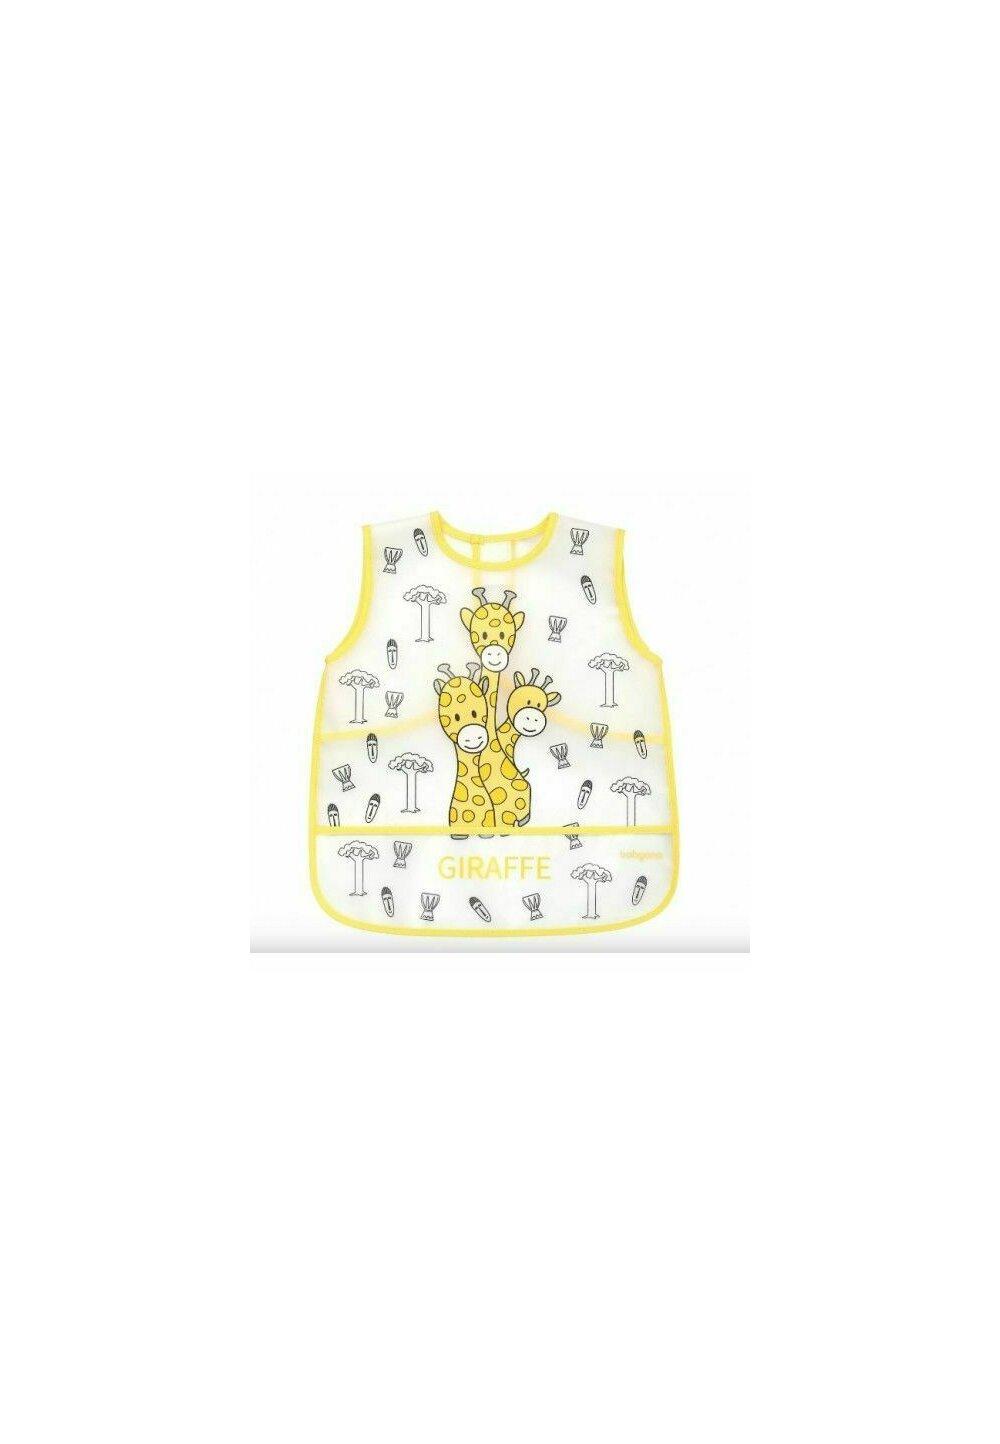 Baveta tip sort, Giraffe, galbena, + 12 luni imagine